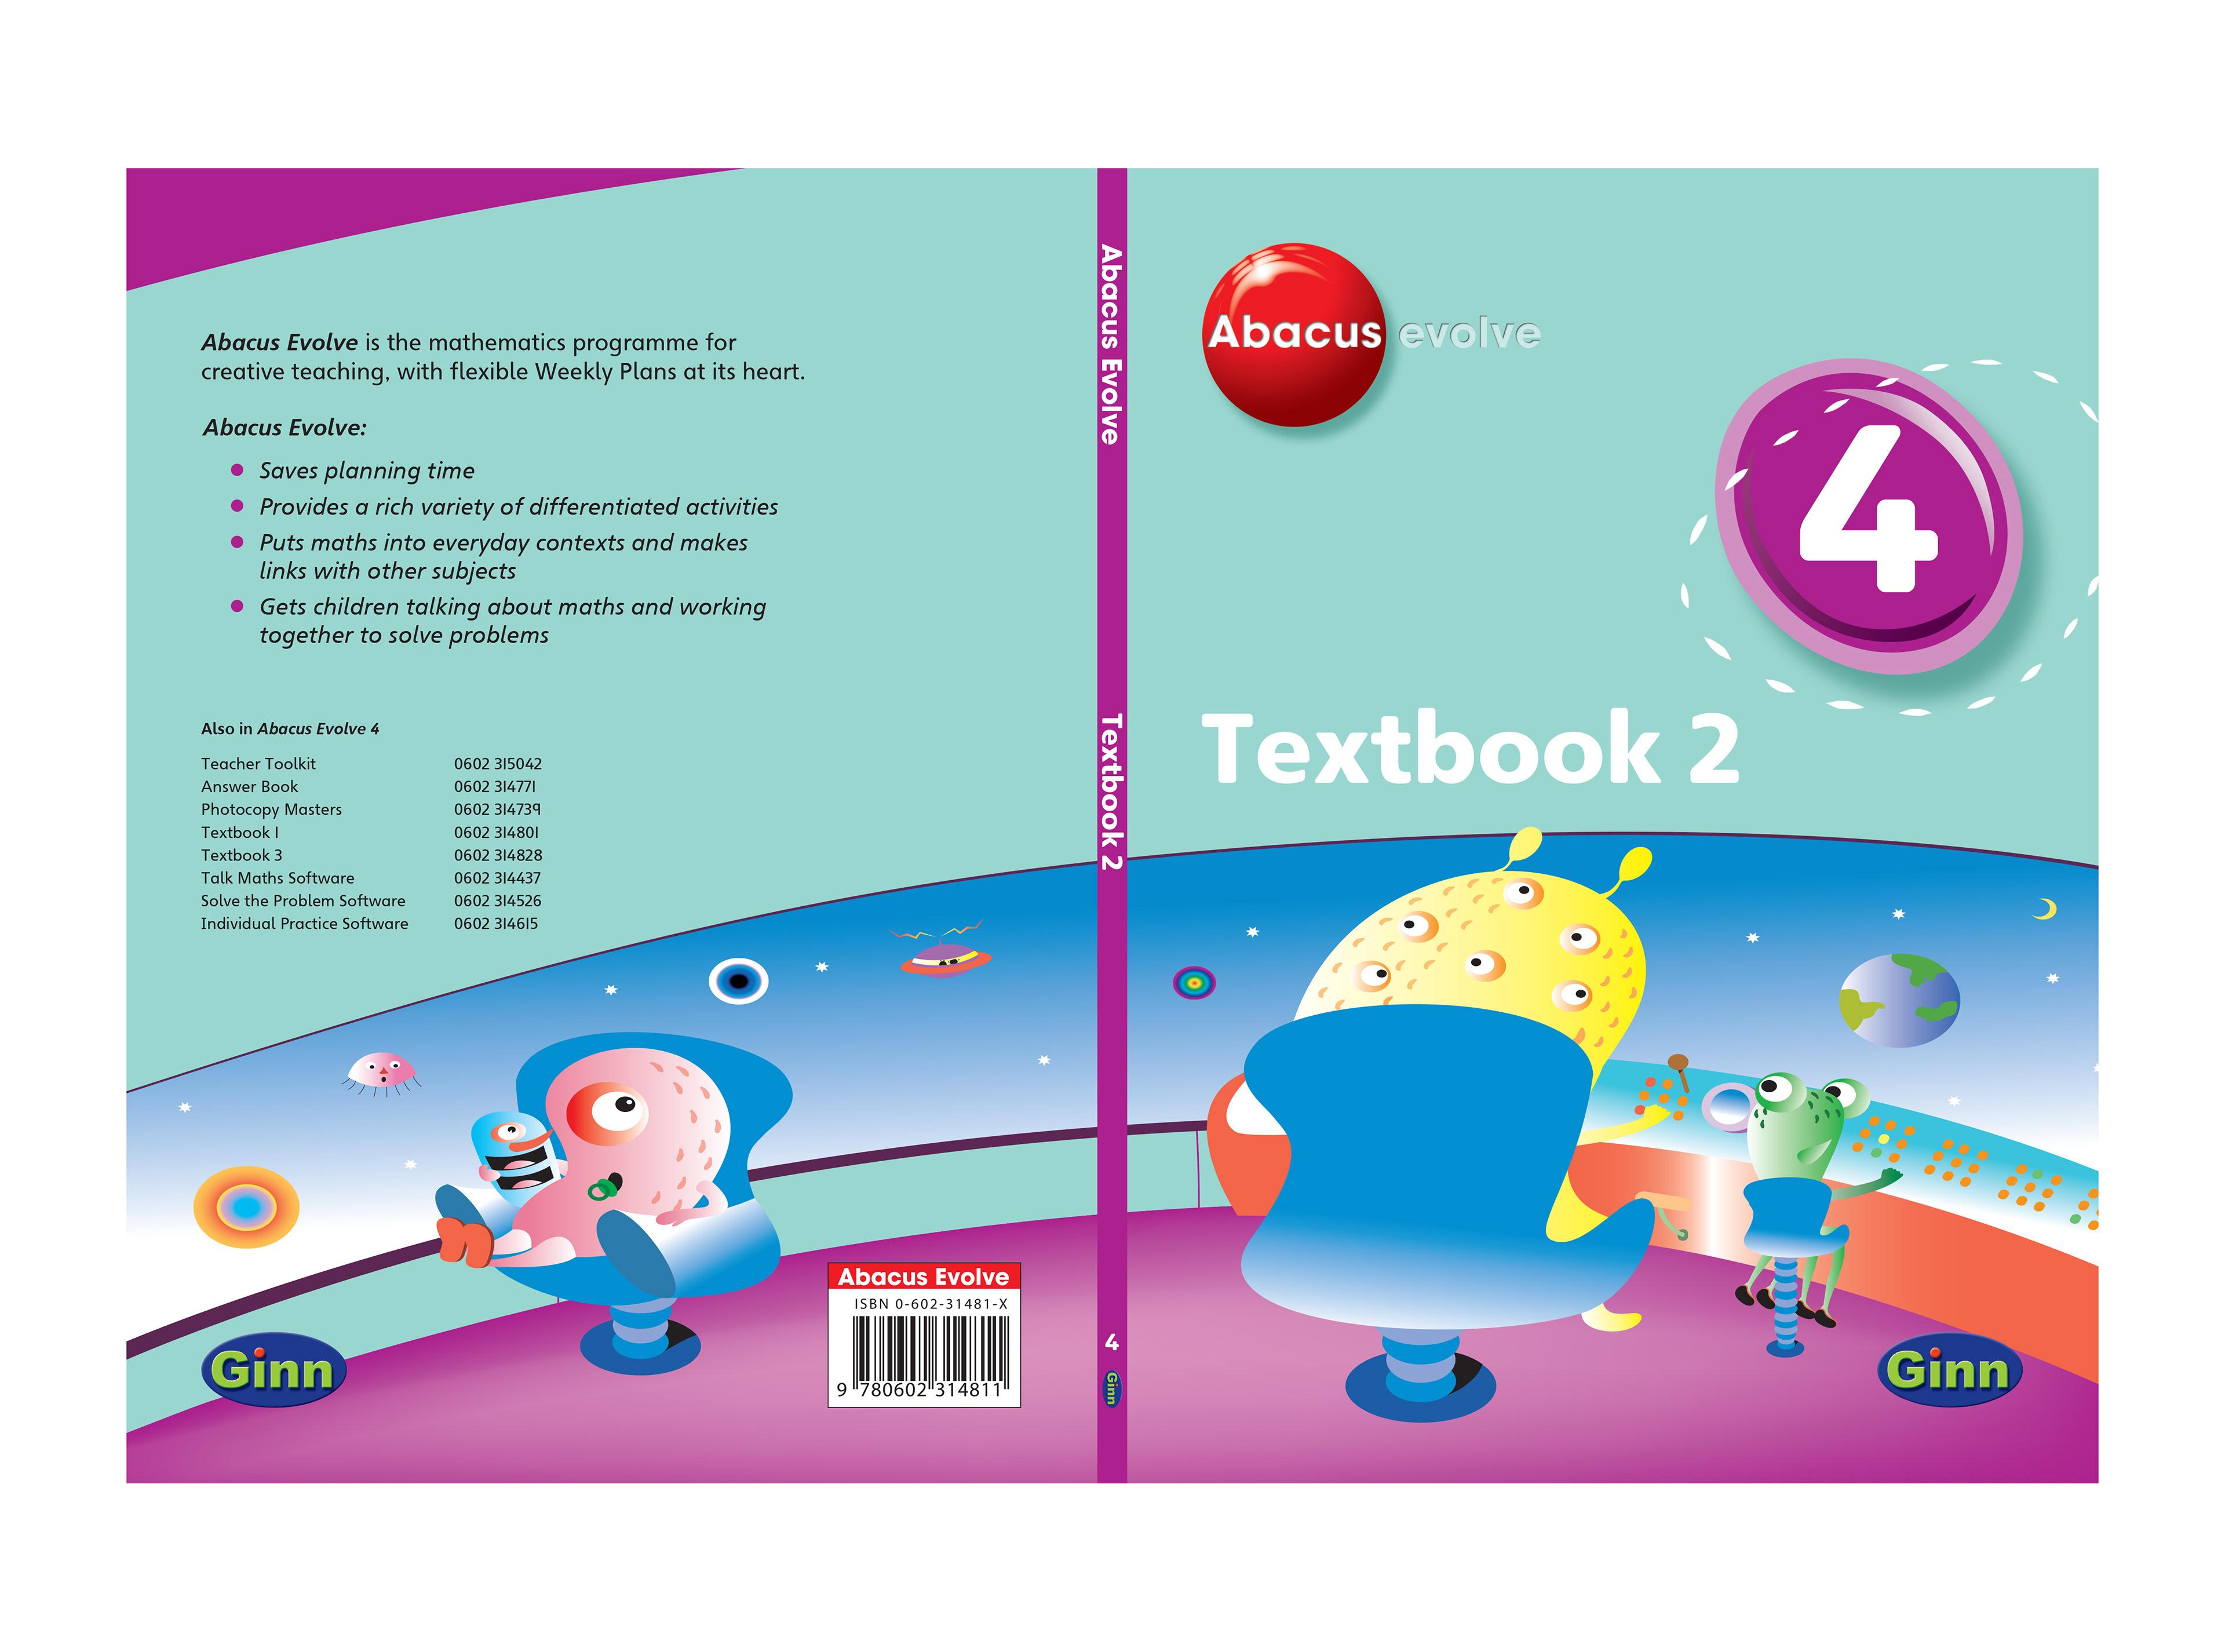 Children Education Book Cover : Per josé karlén ginn abacus evolve book covers